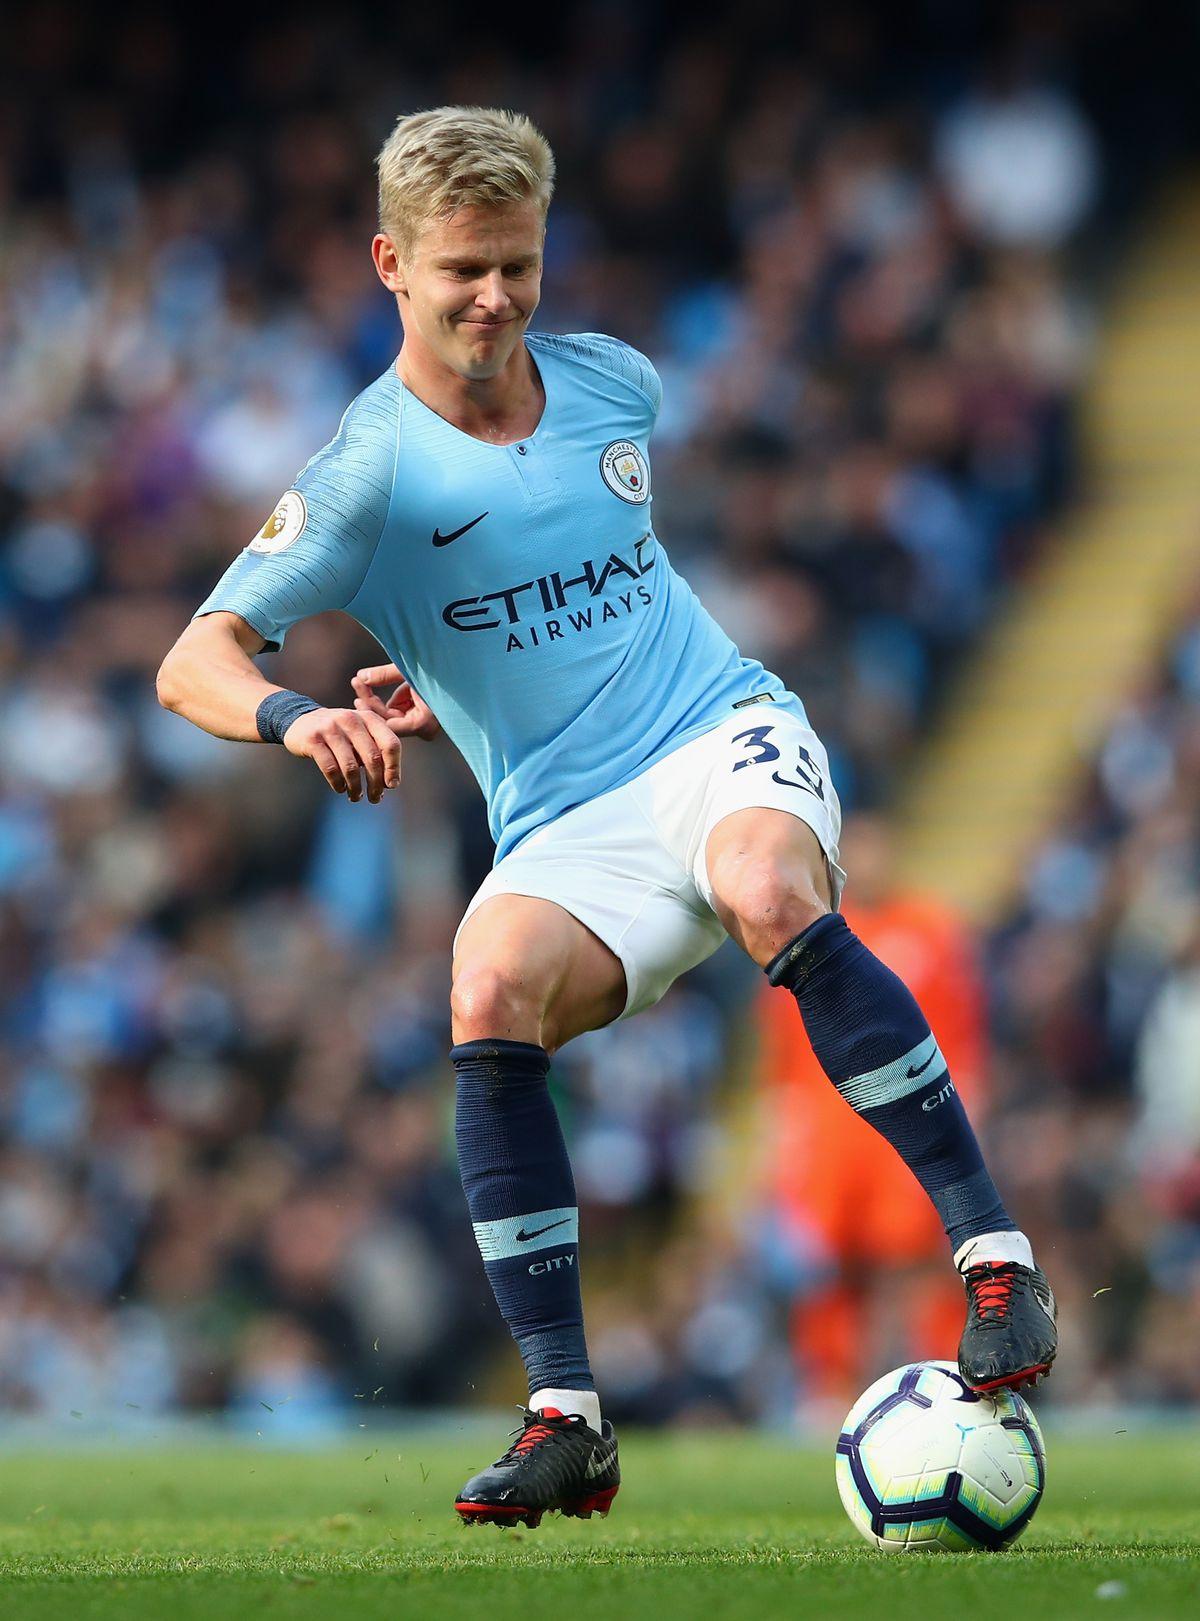 Oleksandr Zinchenko moving the ball - Manchester City - Premier League